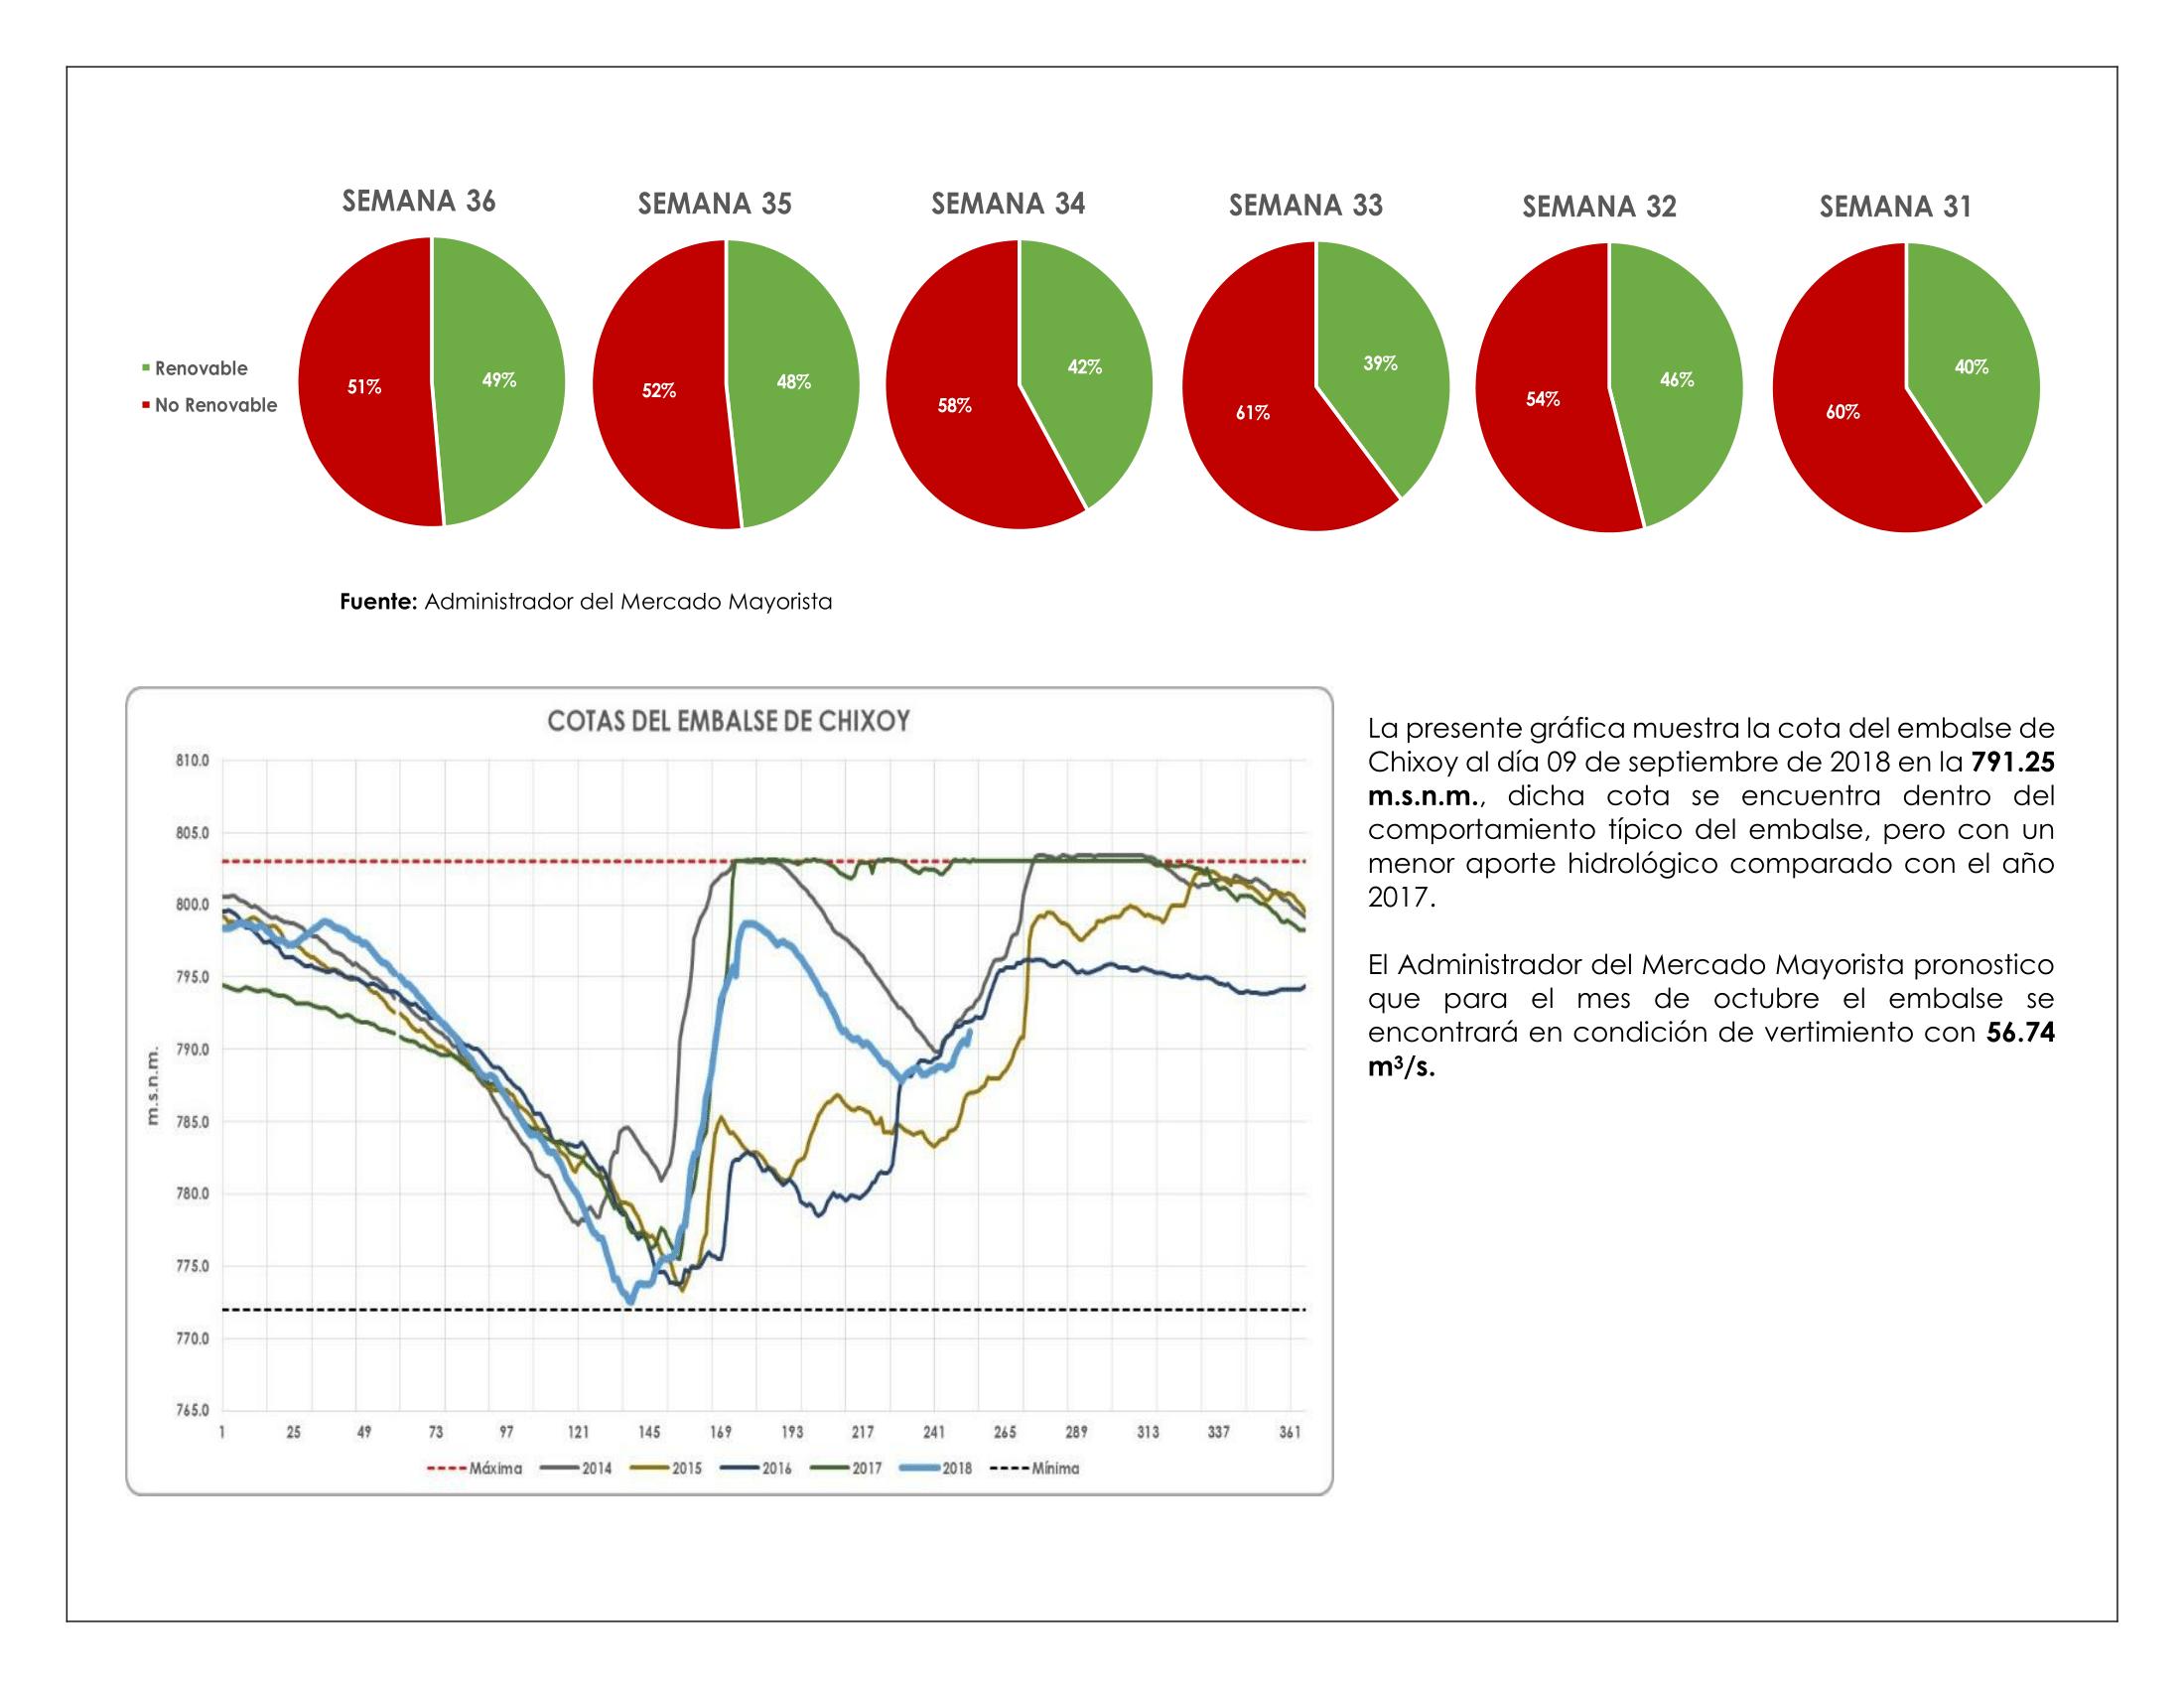 [Semana 36]-3